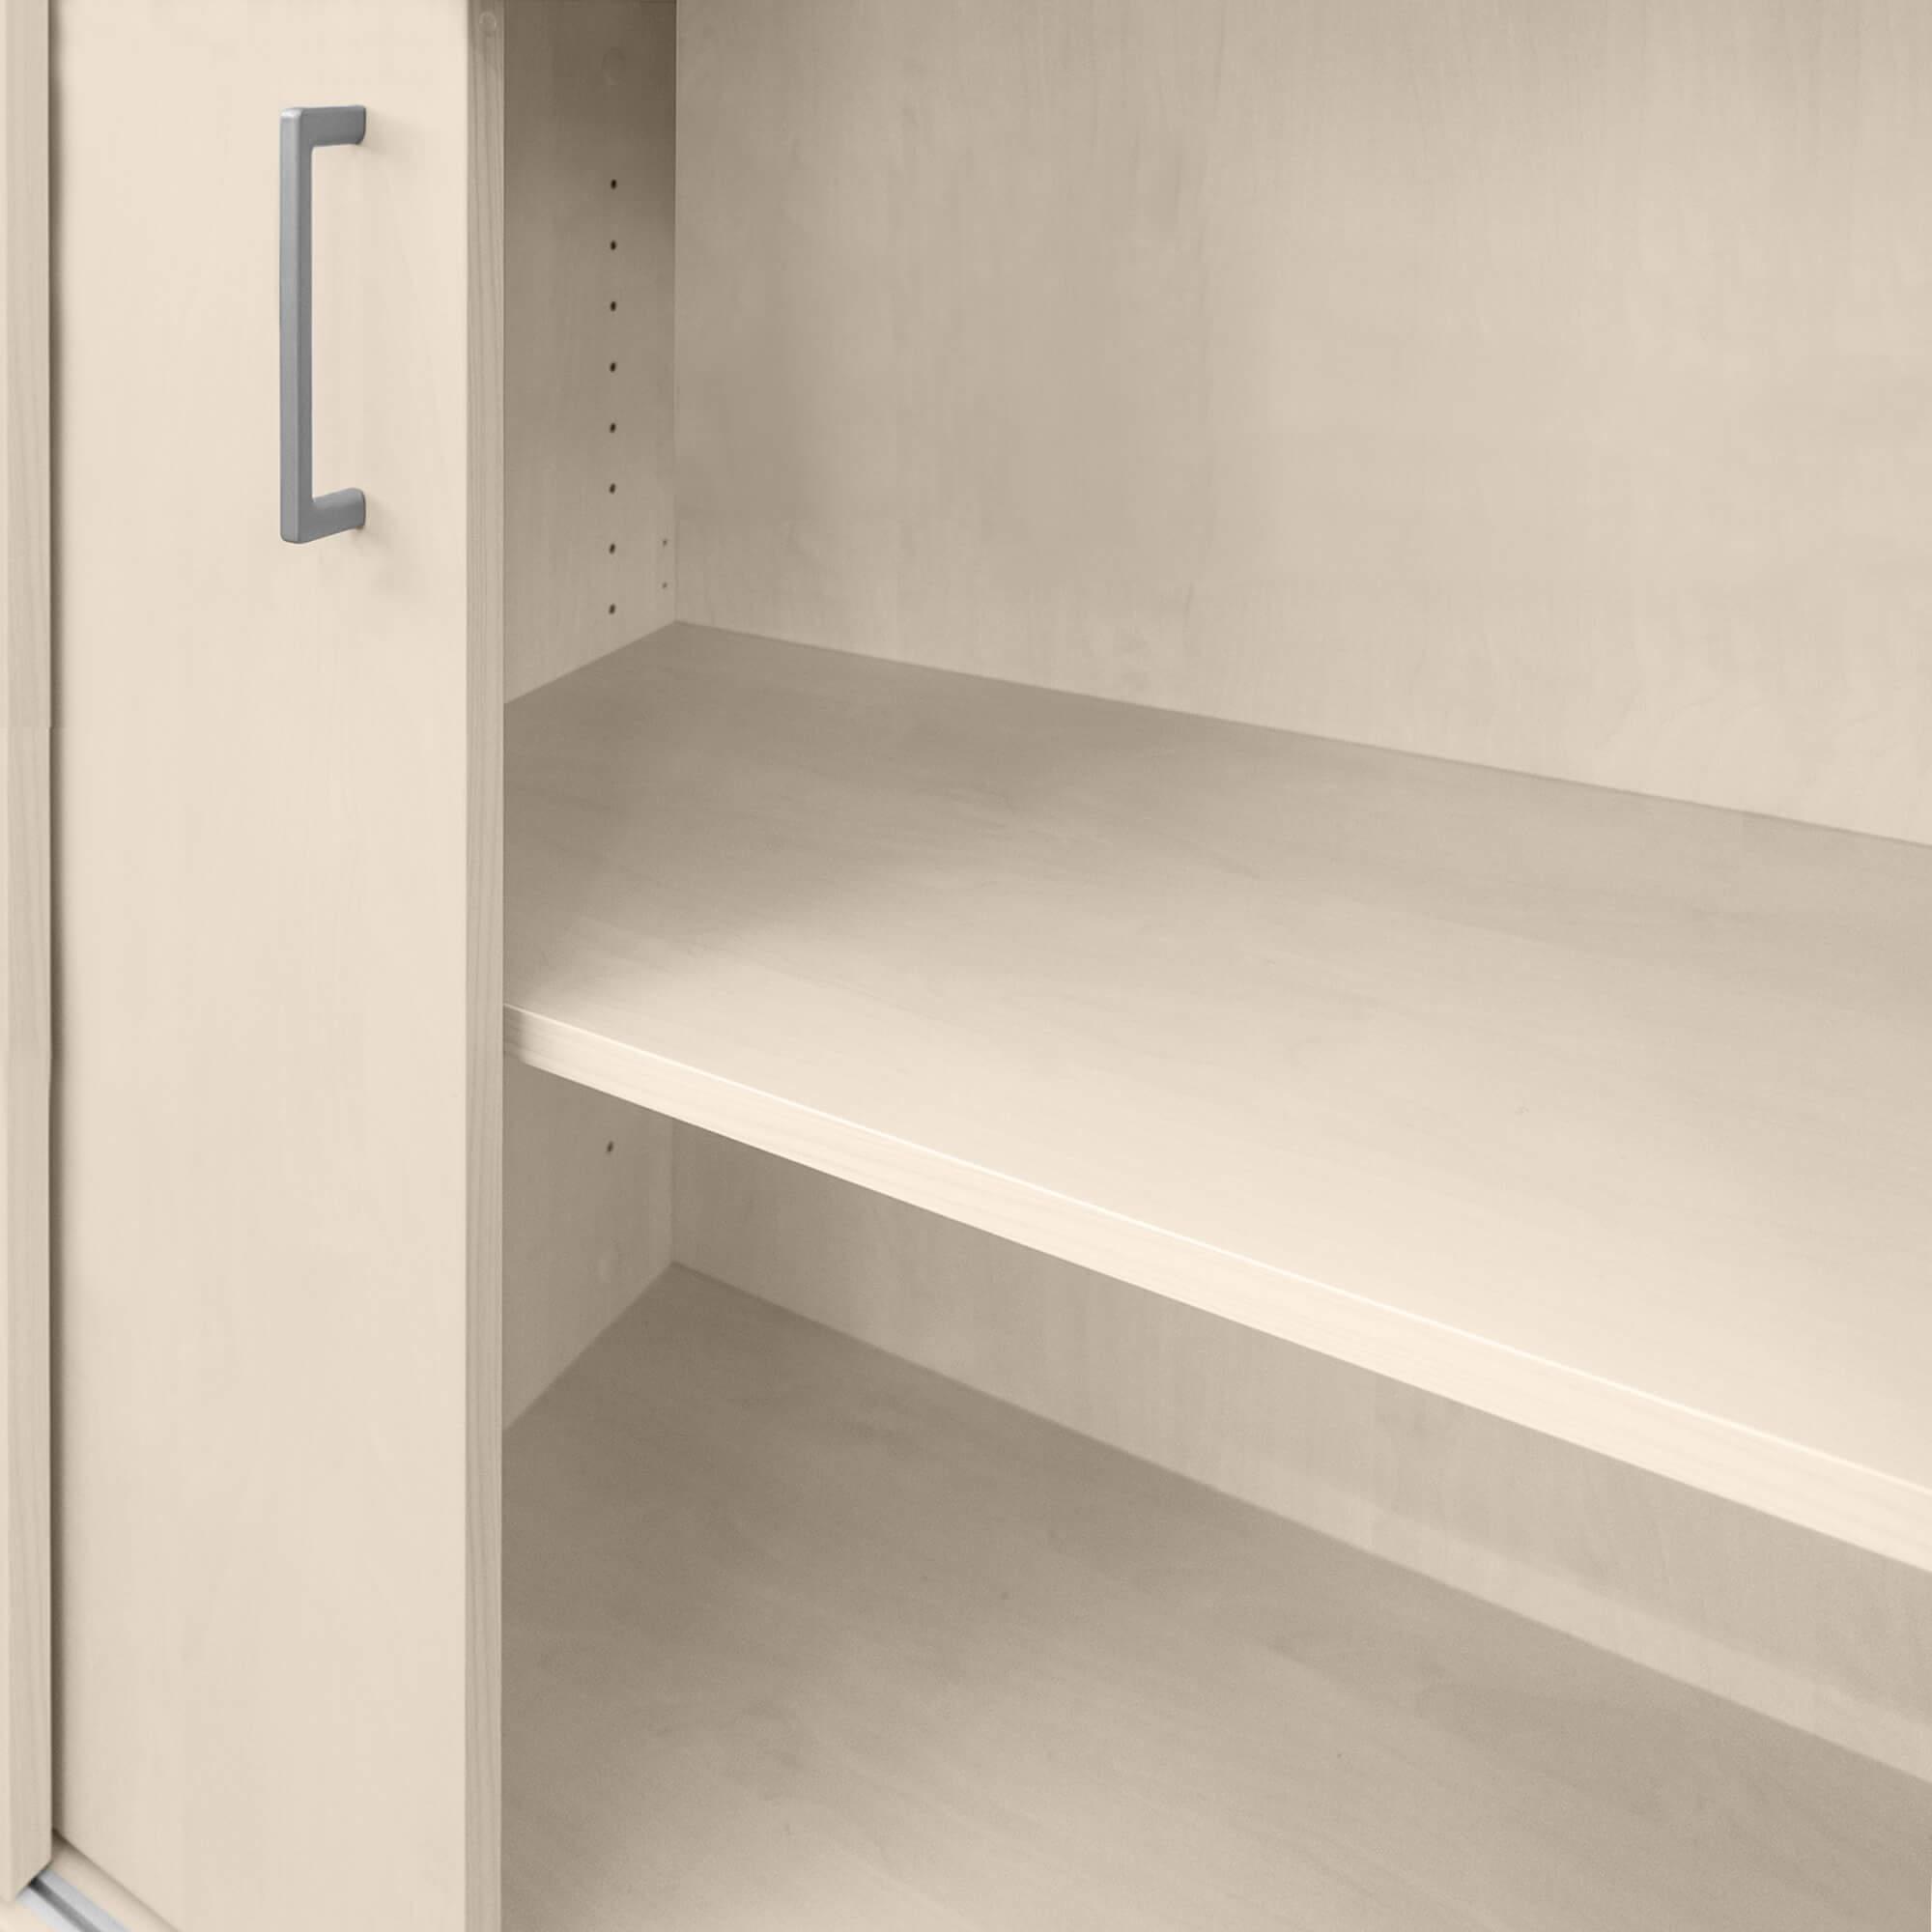 PROFI Schrankwand abschließbar Schrank Büroschrank Flügeltürenschrank Regalschrank 5 OH Ahorn